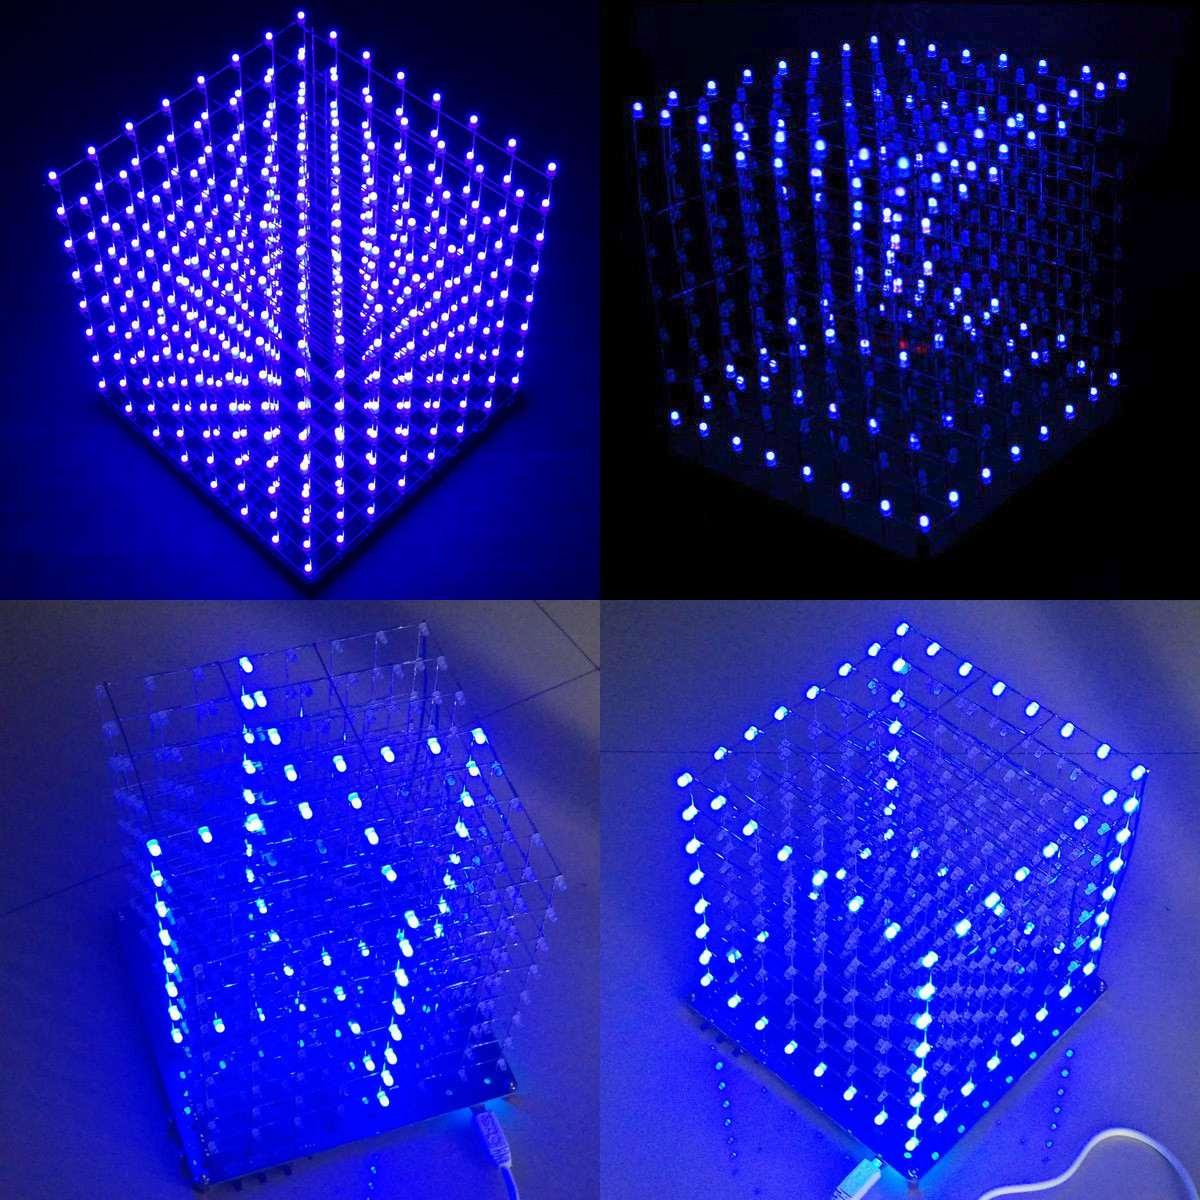 LEORY 8x8X8 512LED Fog Lamp DIY 3D LED Light Cube Kit Diy Electronic Kit With Accessory  ...